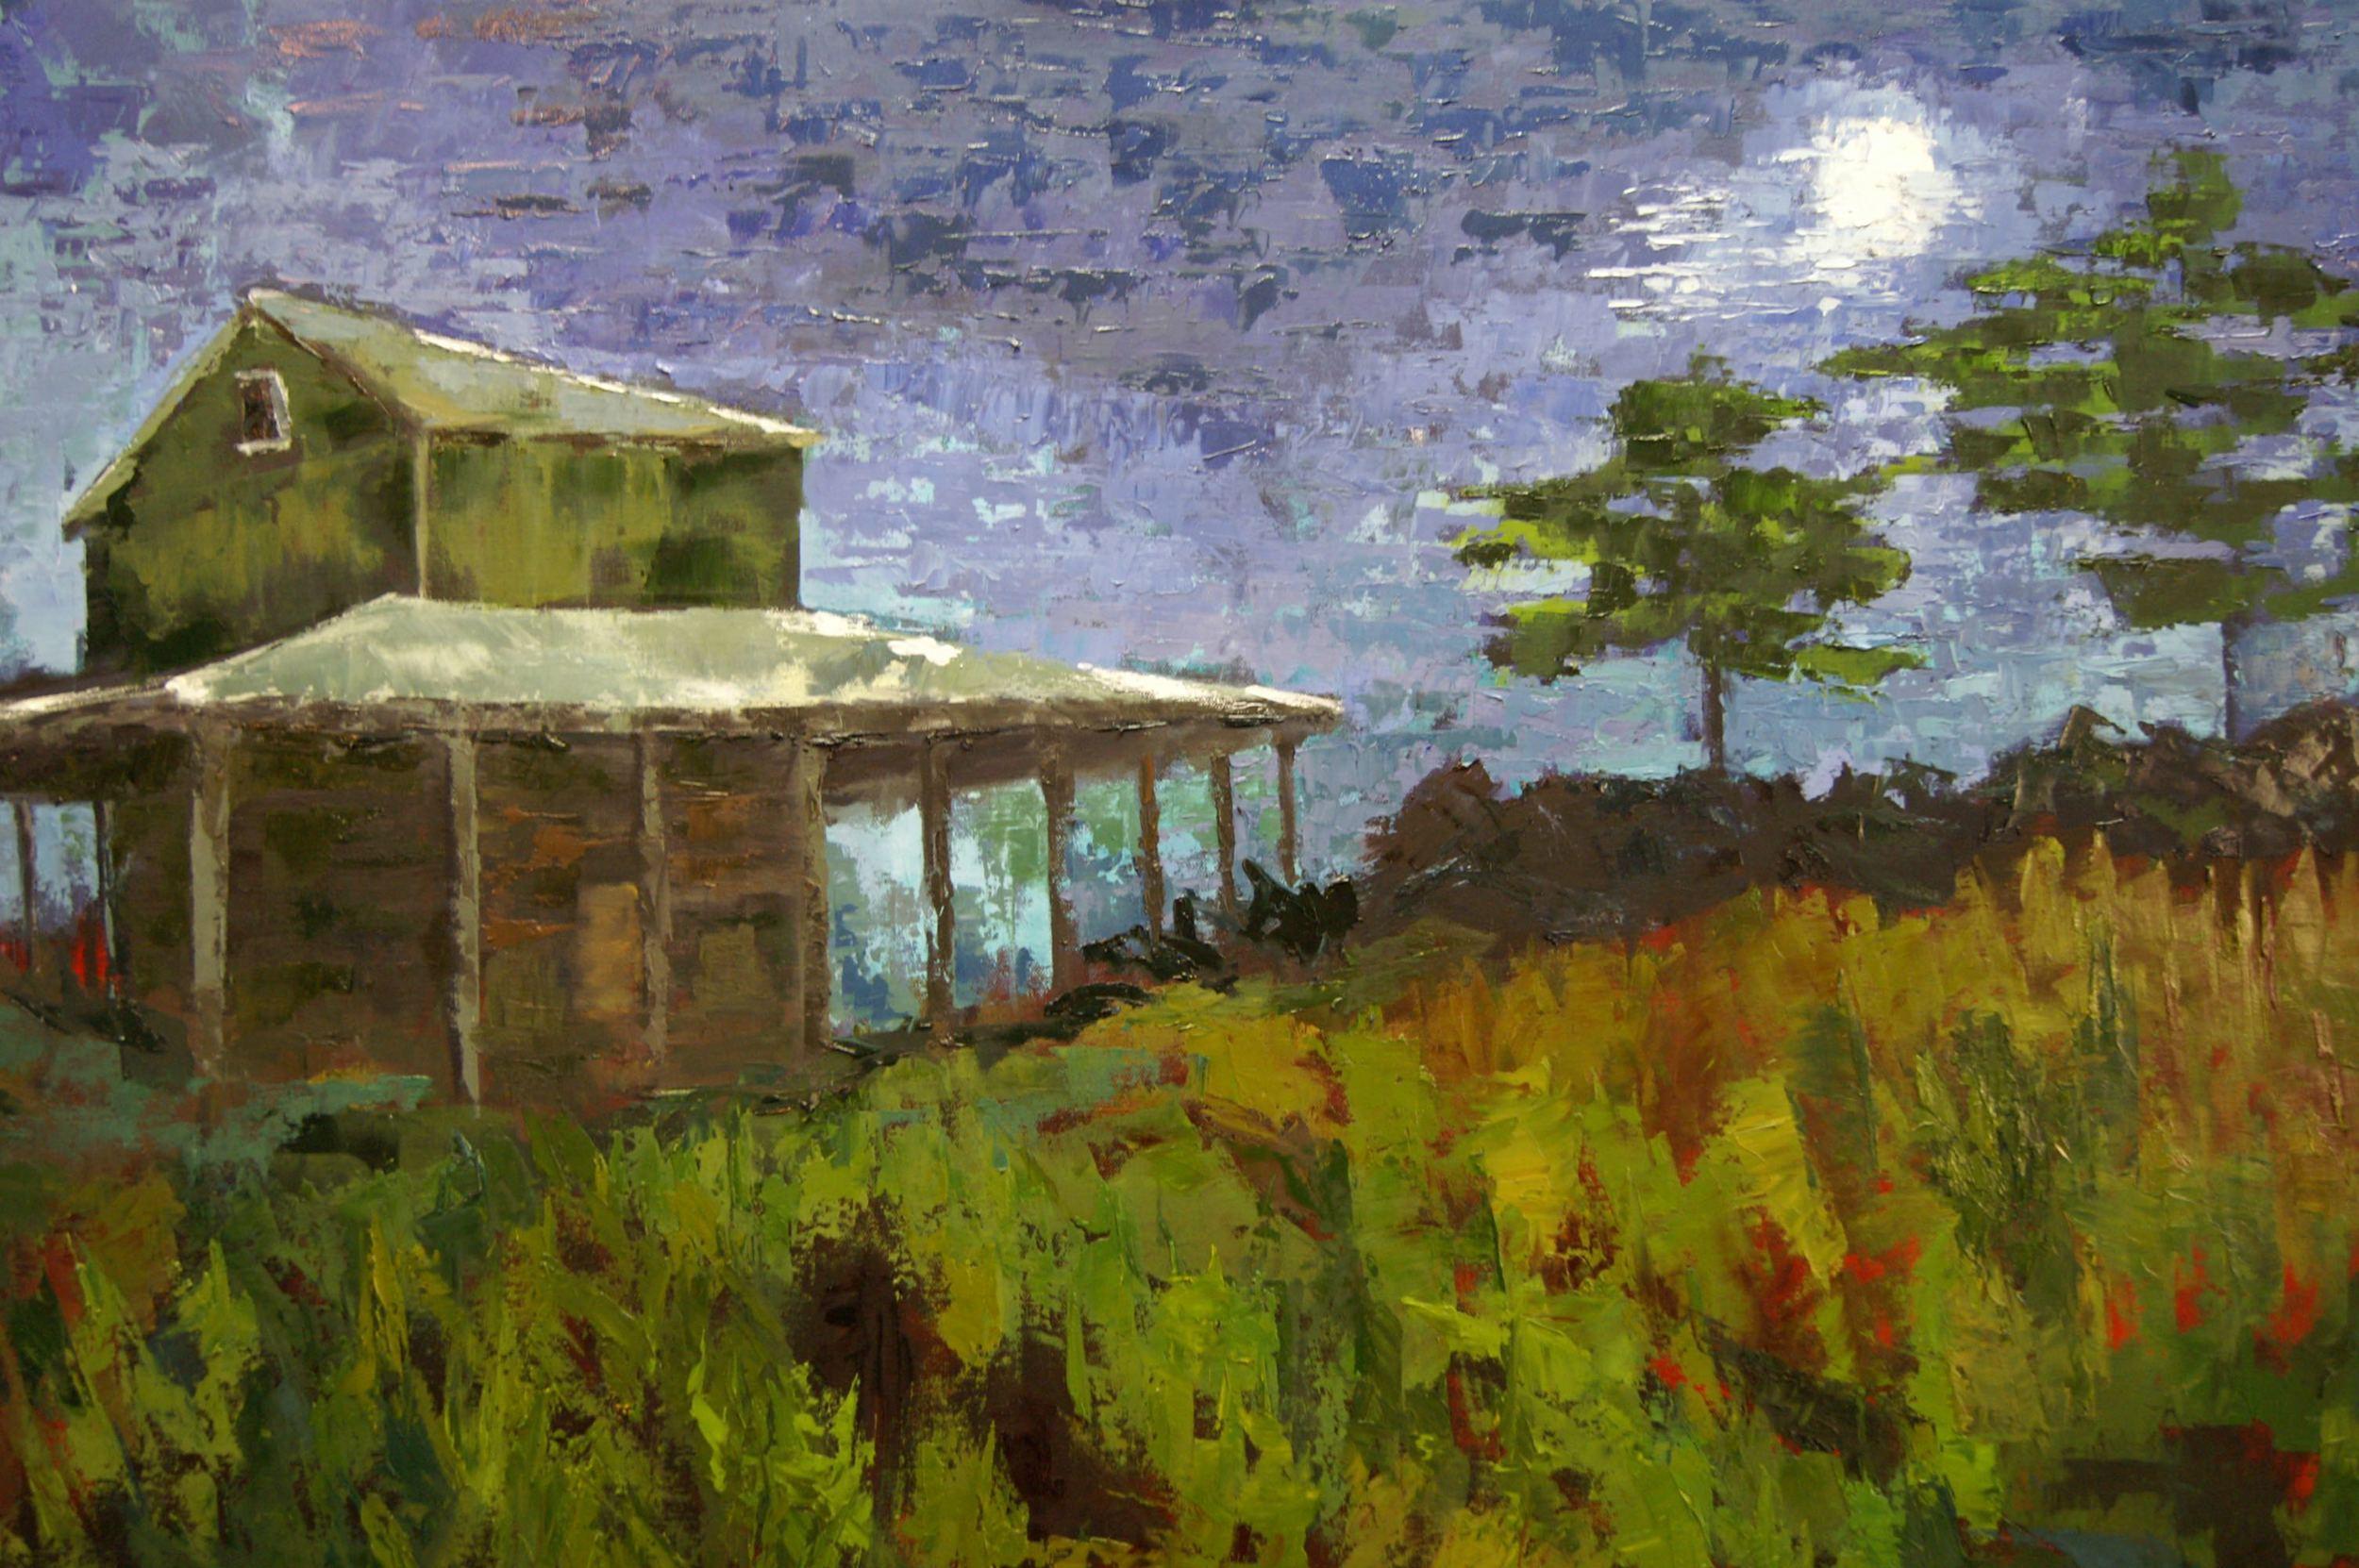 PeeDee Moon (48x36 Canvas) - Available